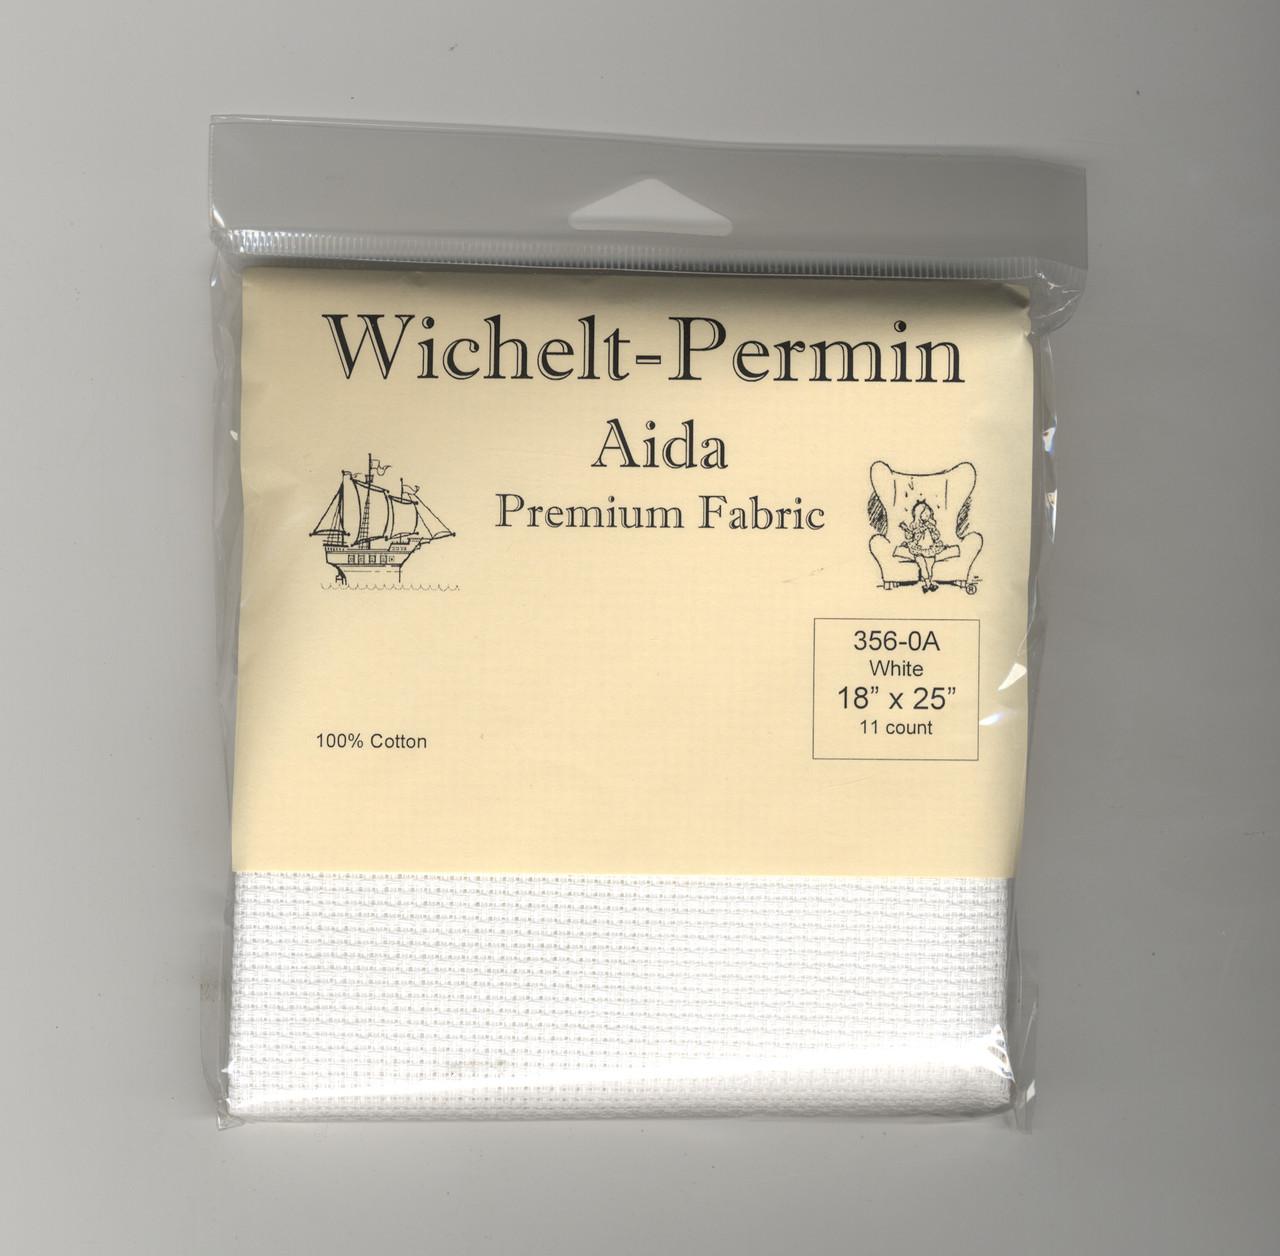 "Wichelt - 11 Count White Aida 18"" x 25"""